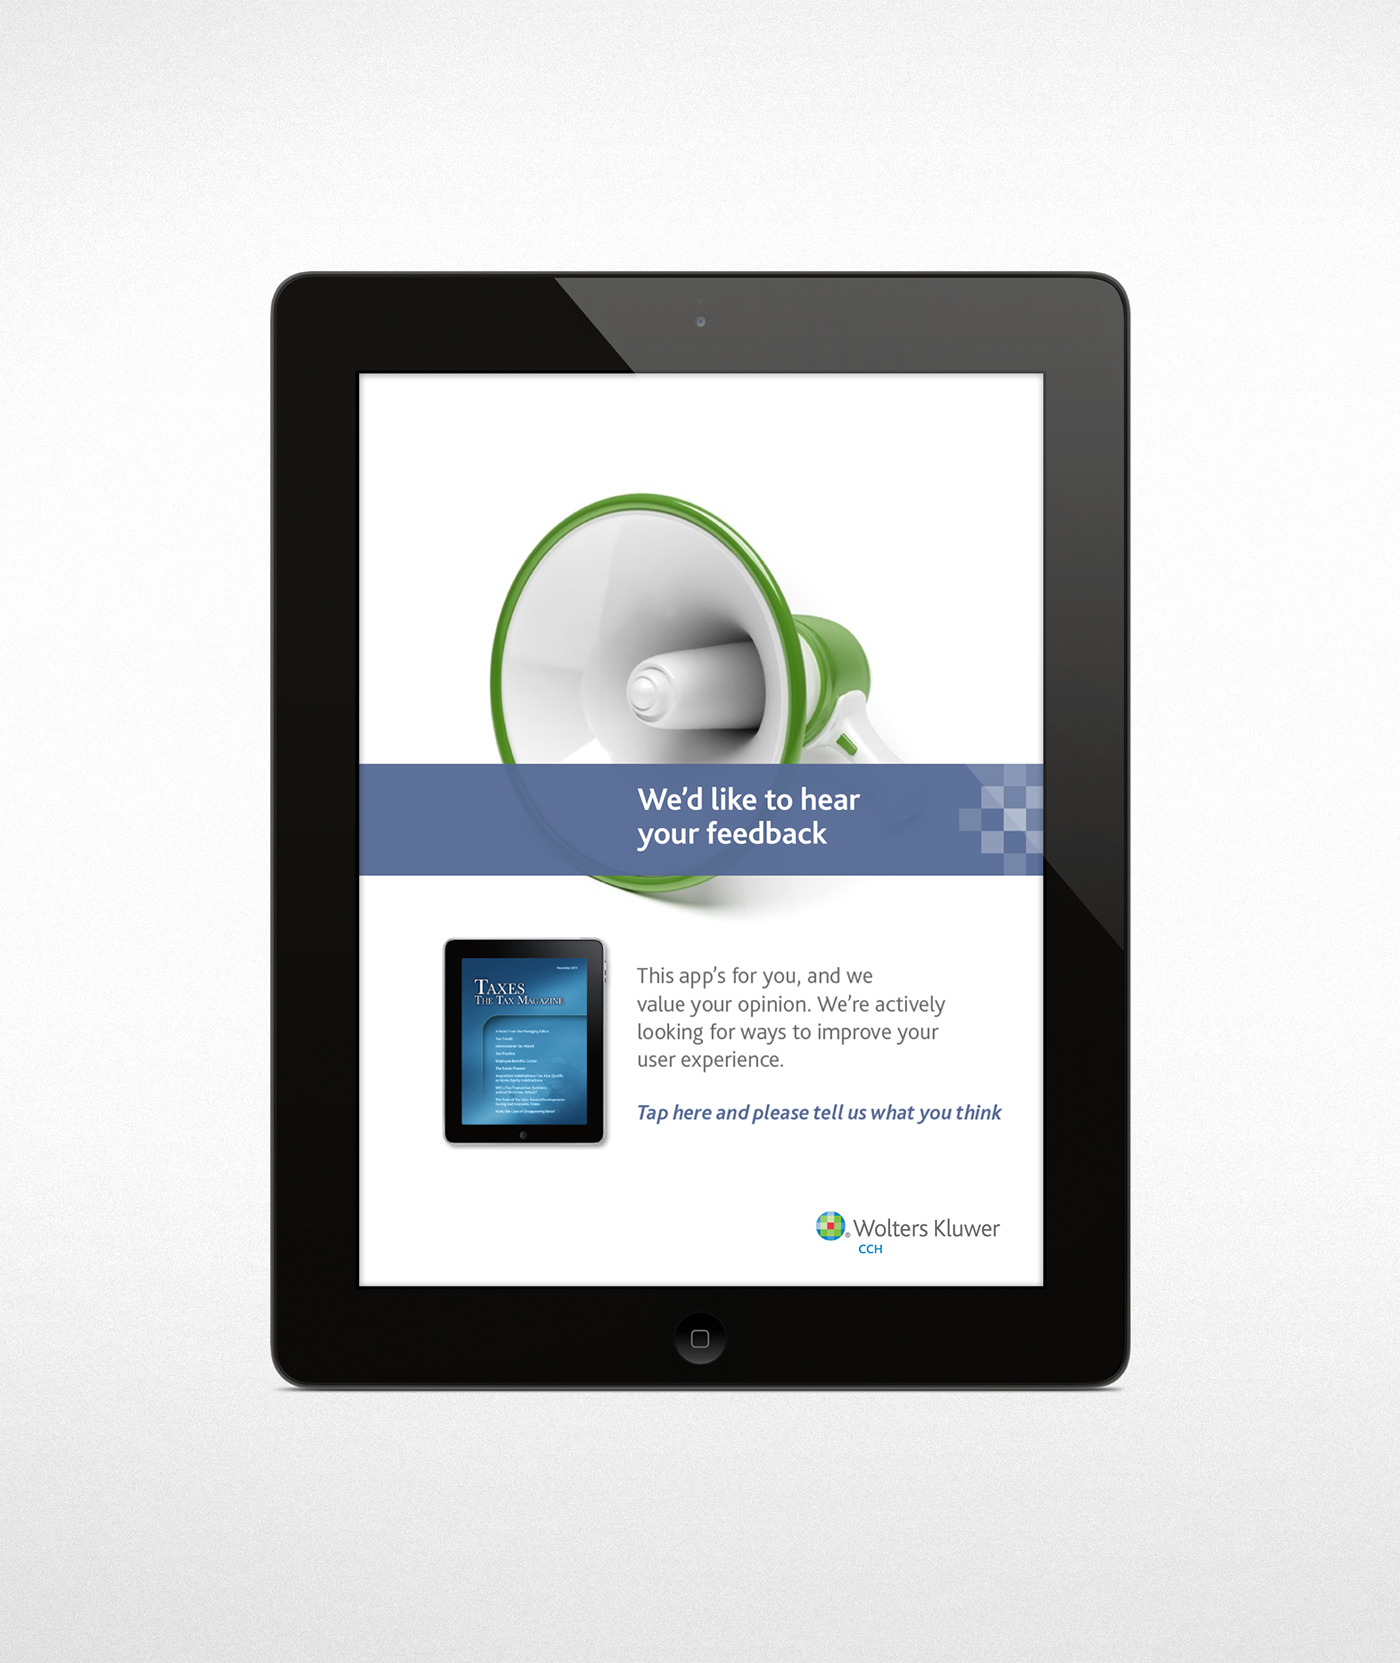 ios digital publishing suite Adobe DPS